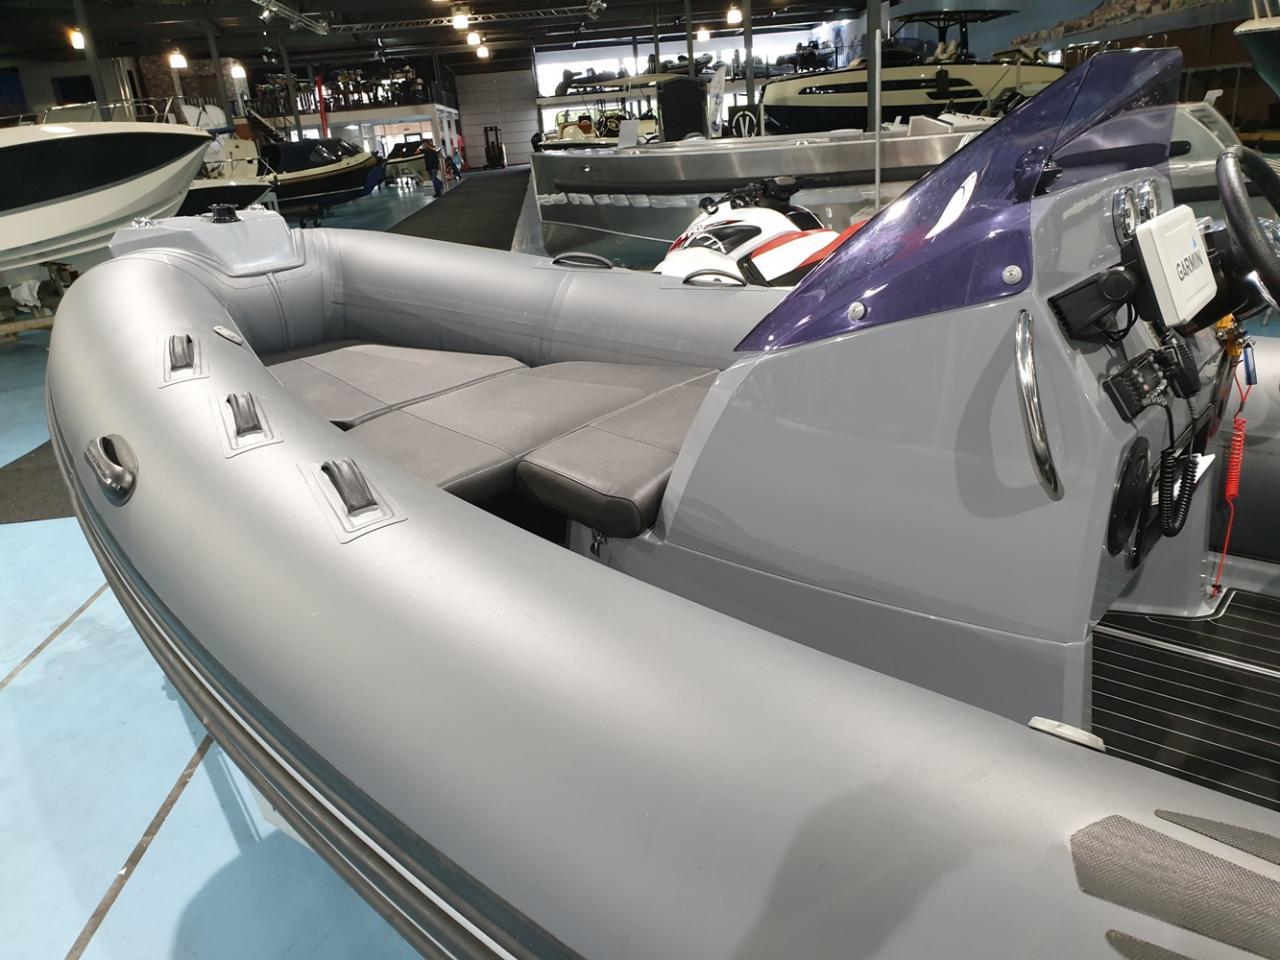 Brig Eagle 580 met Mercury 115 pk PRO XS  4